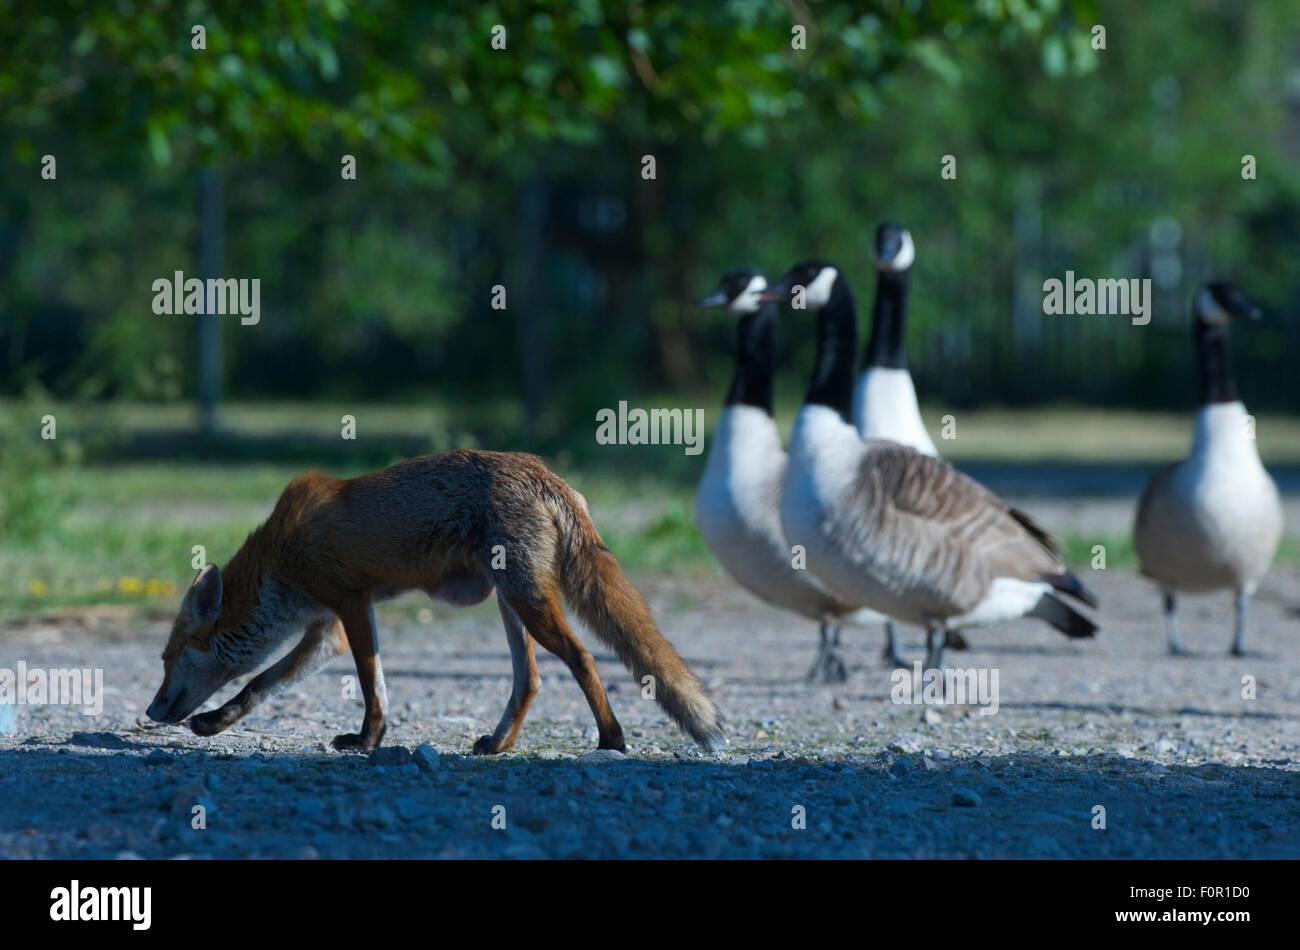 canada goose red fox